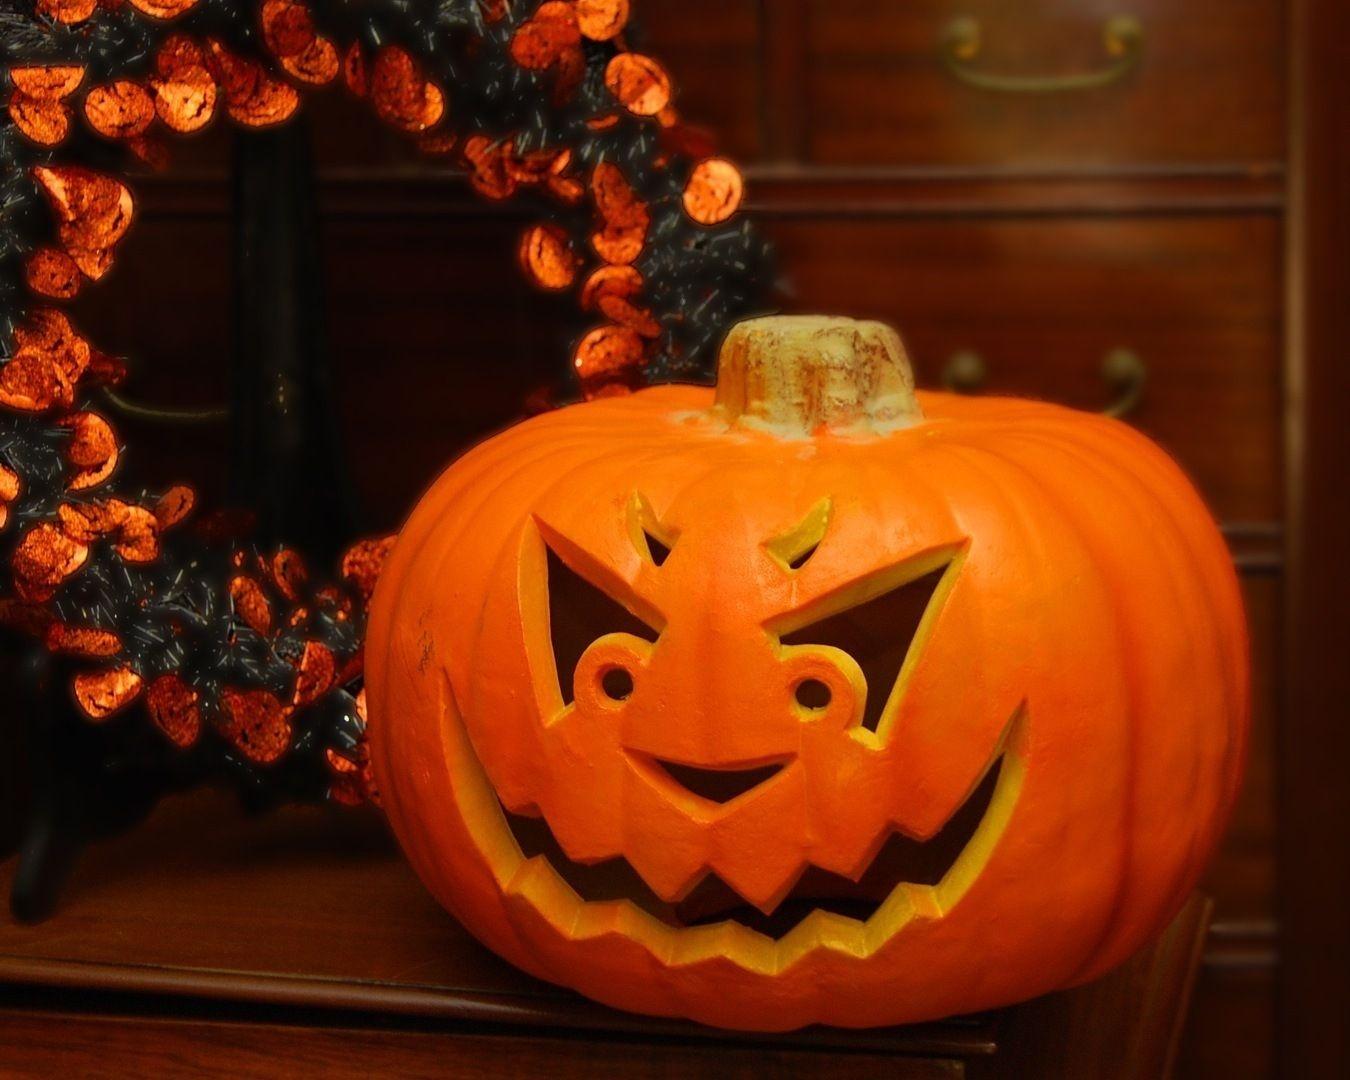 Image Result For Lanterns | Halloween | Halloween Pumpkin Designs - Free Online Pumpkin Carving Patterns Printable